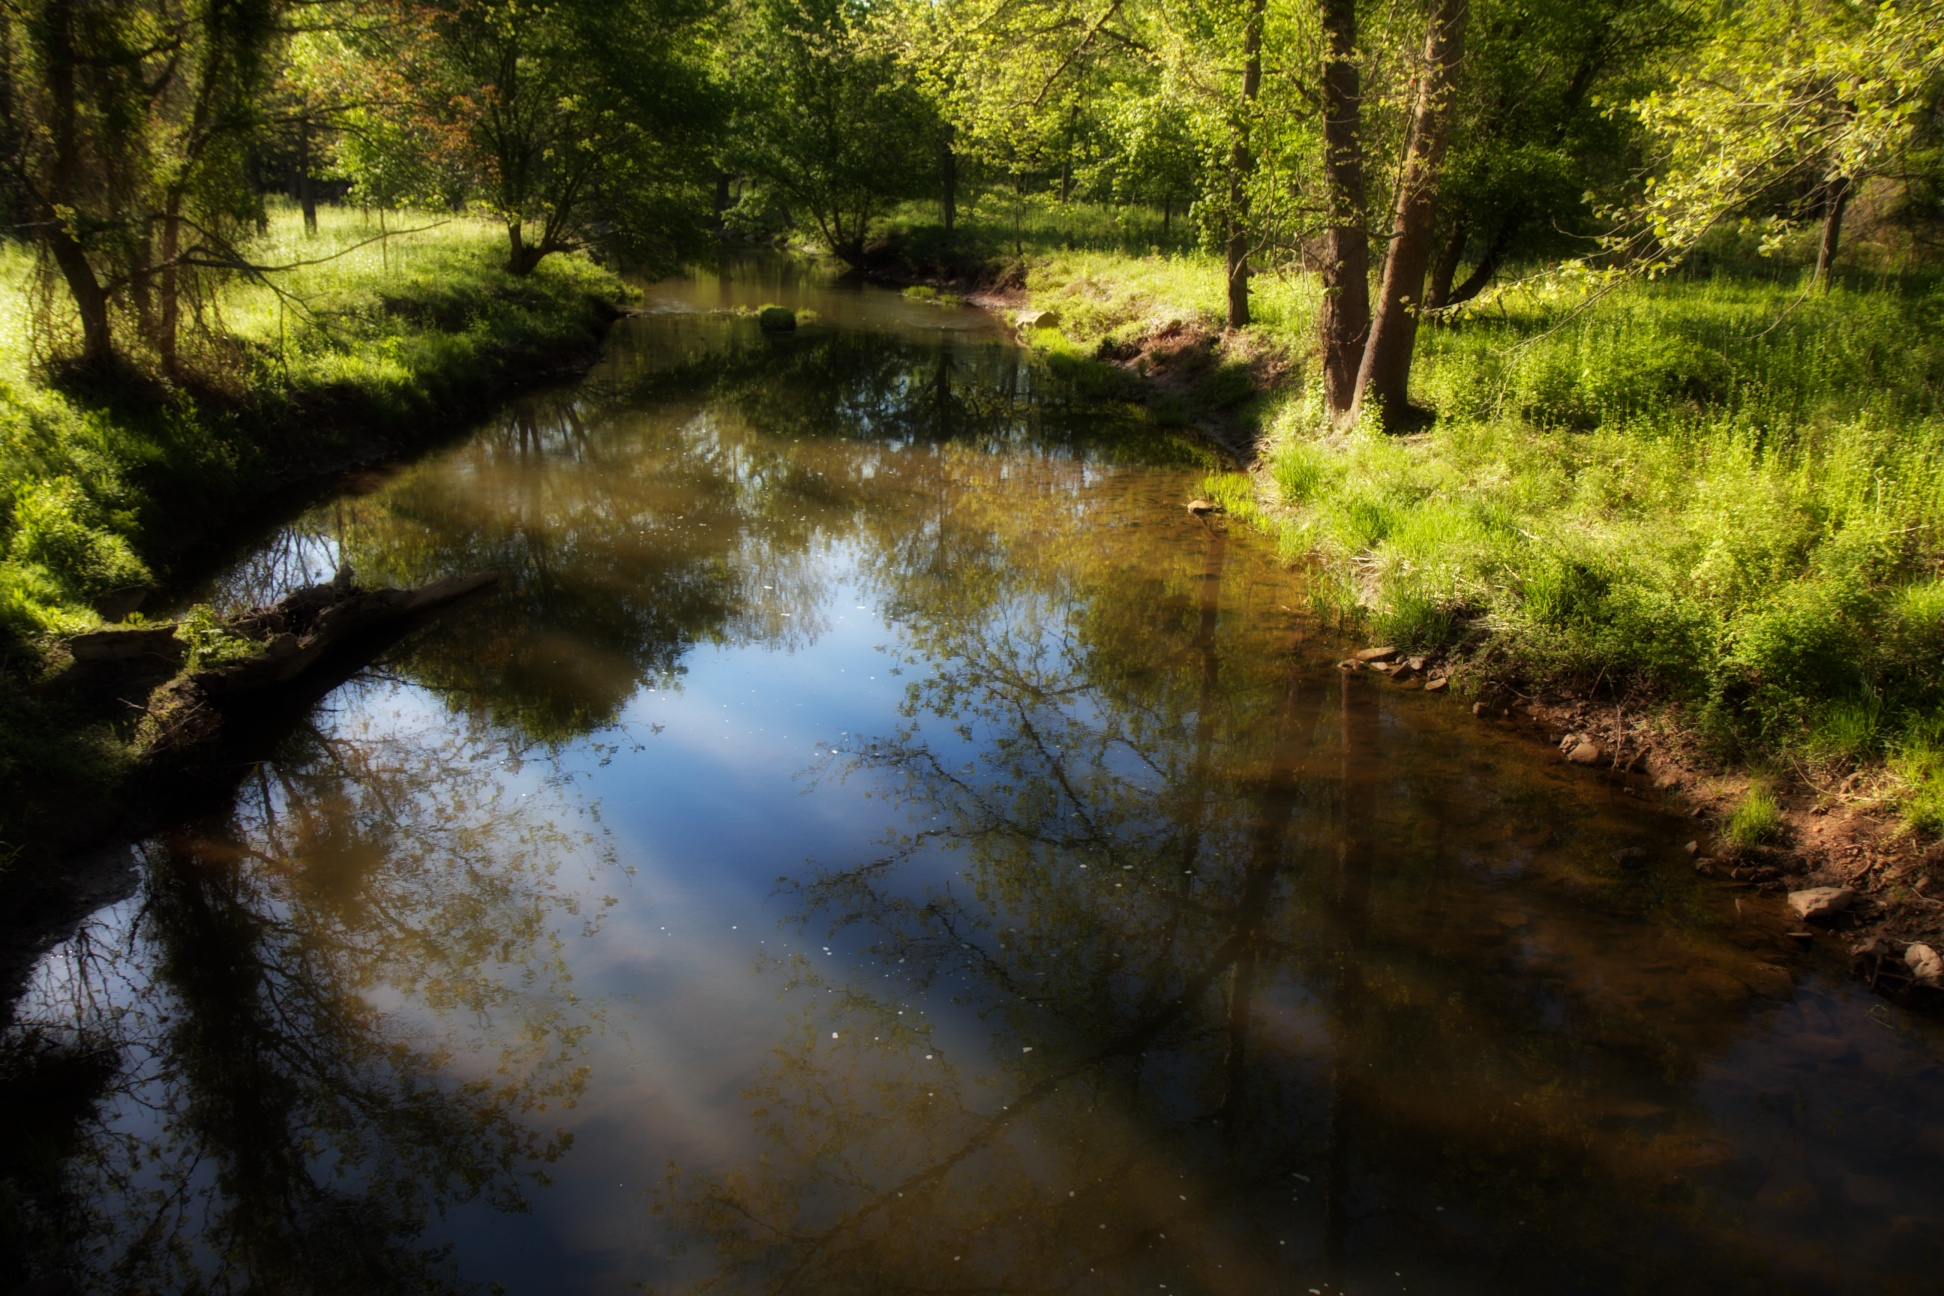 Description broad river fauquier county